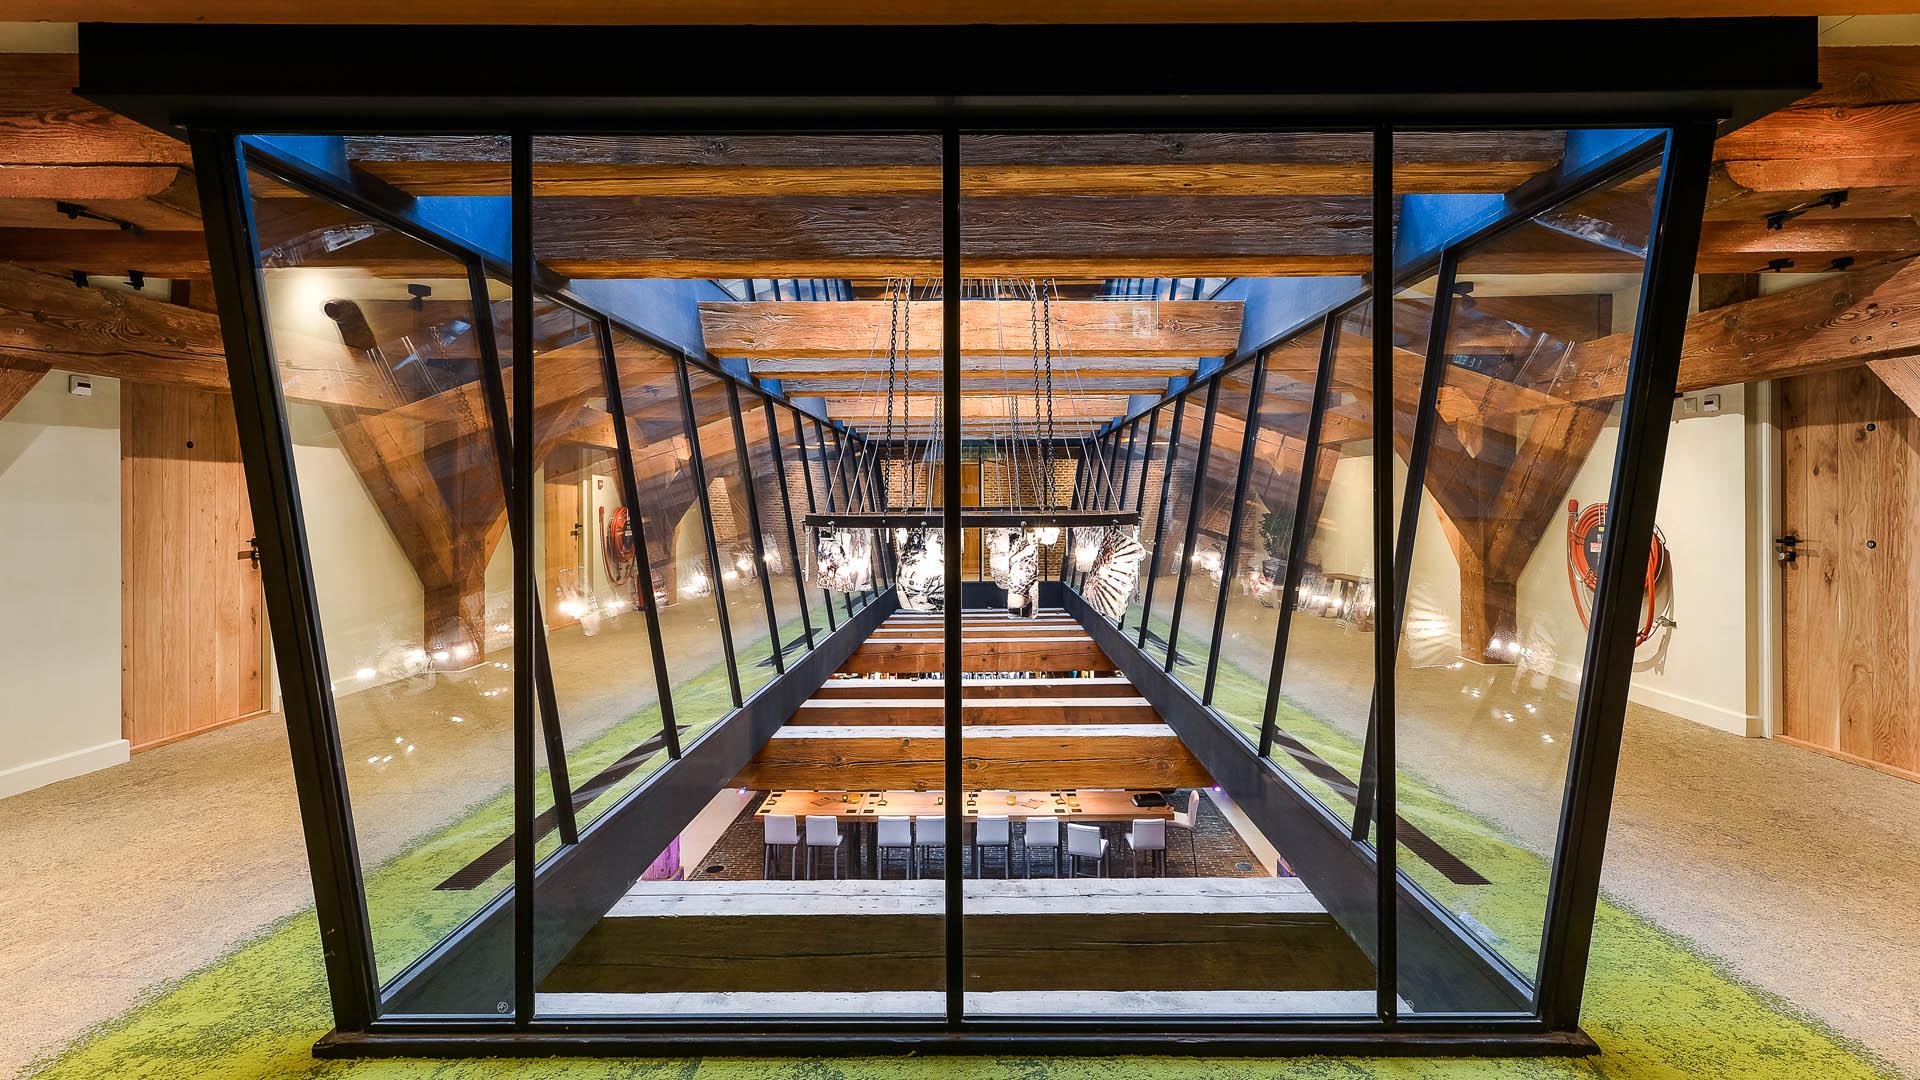 Internal steel glazed partitions at the restaurant het Arsenaal in Woerden, the Netherlands